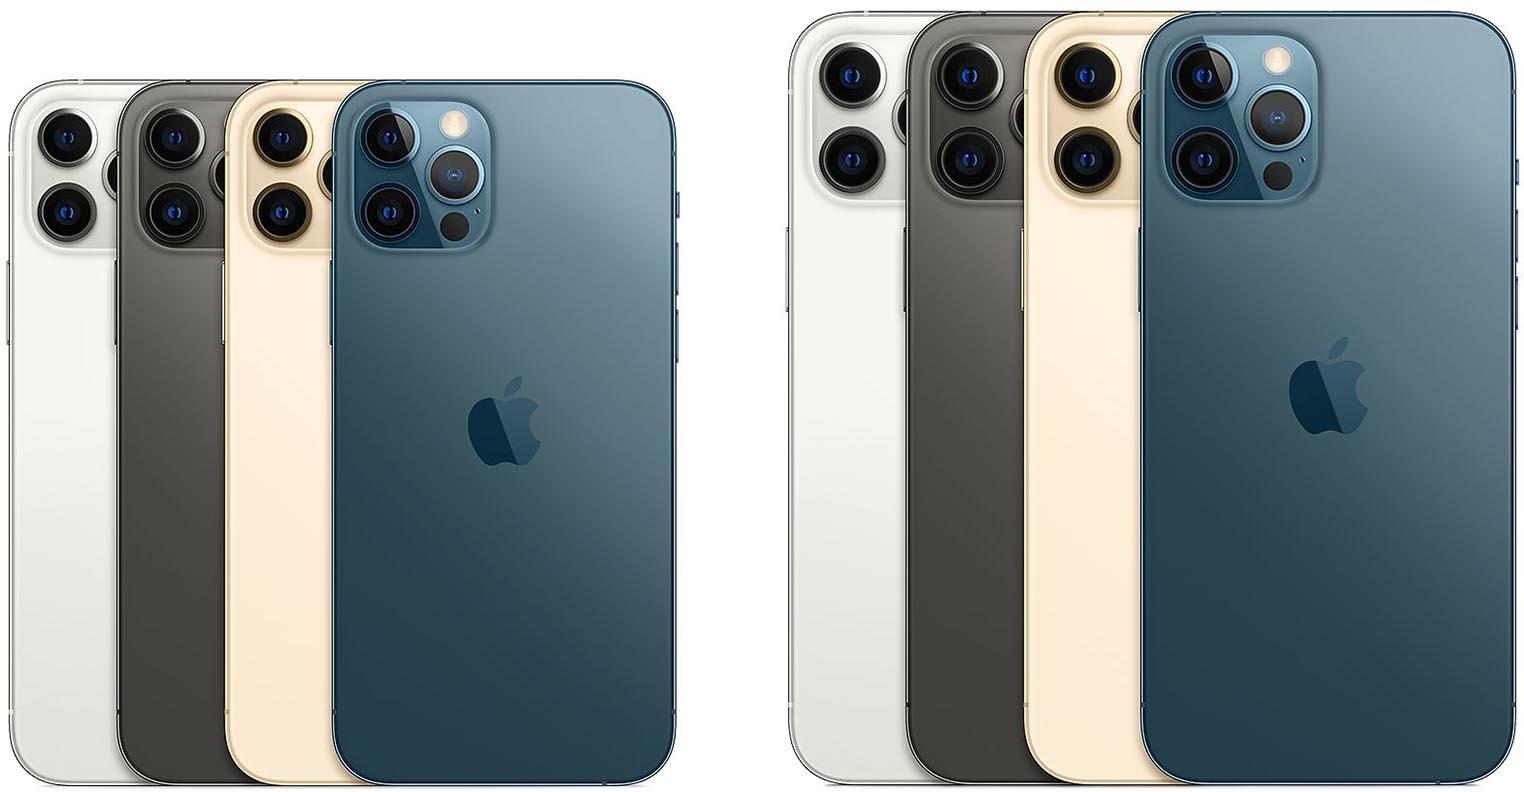 iPhone 12 Pro iPhone 12 Pro Max